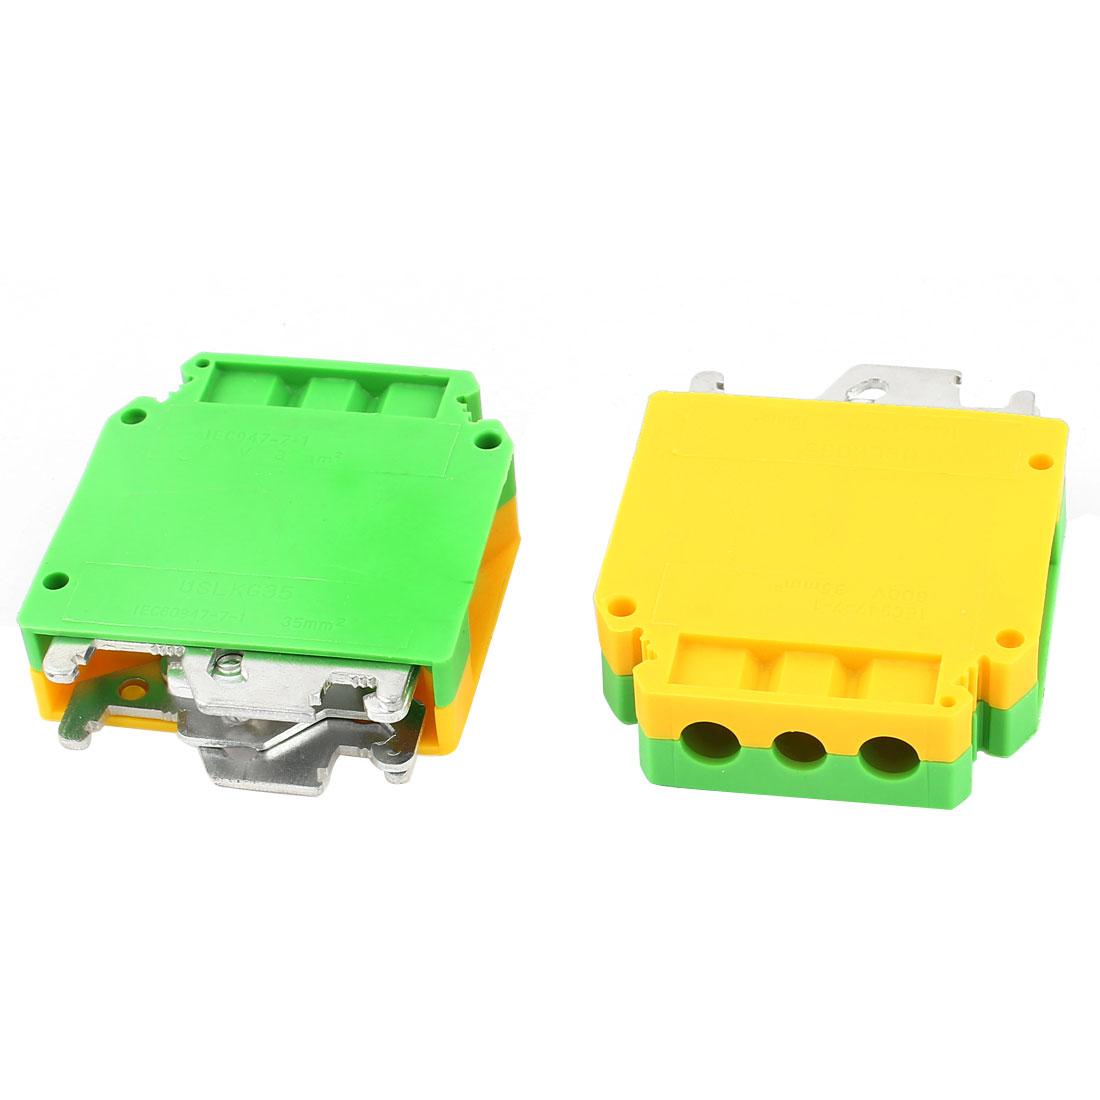 2 Pcs USLKG35 0.75-35mm2 Wire Rail Mount Grounding Terminal Block Yellow Green